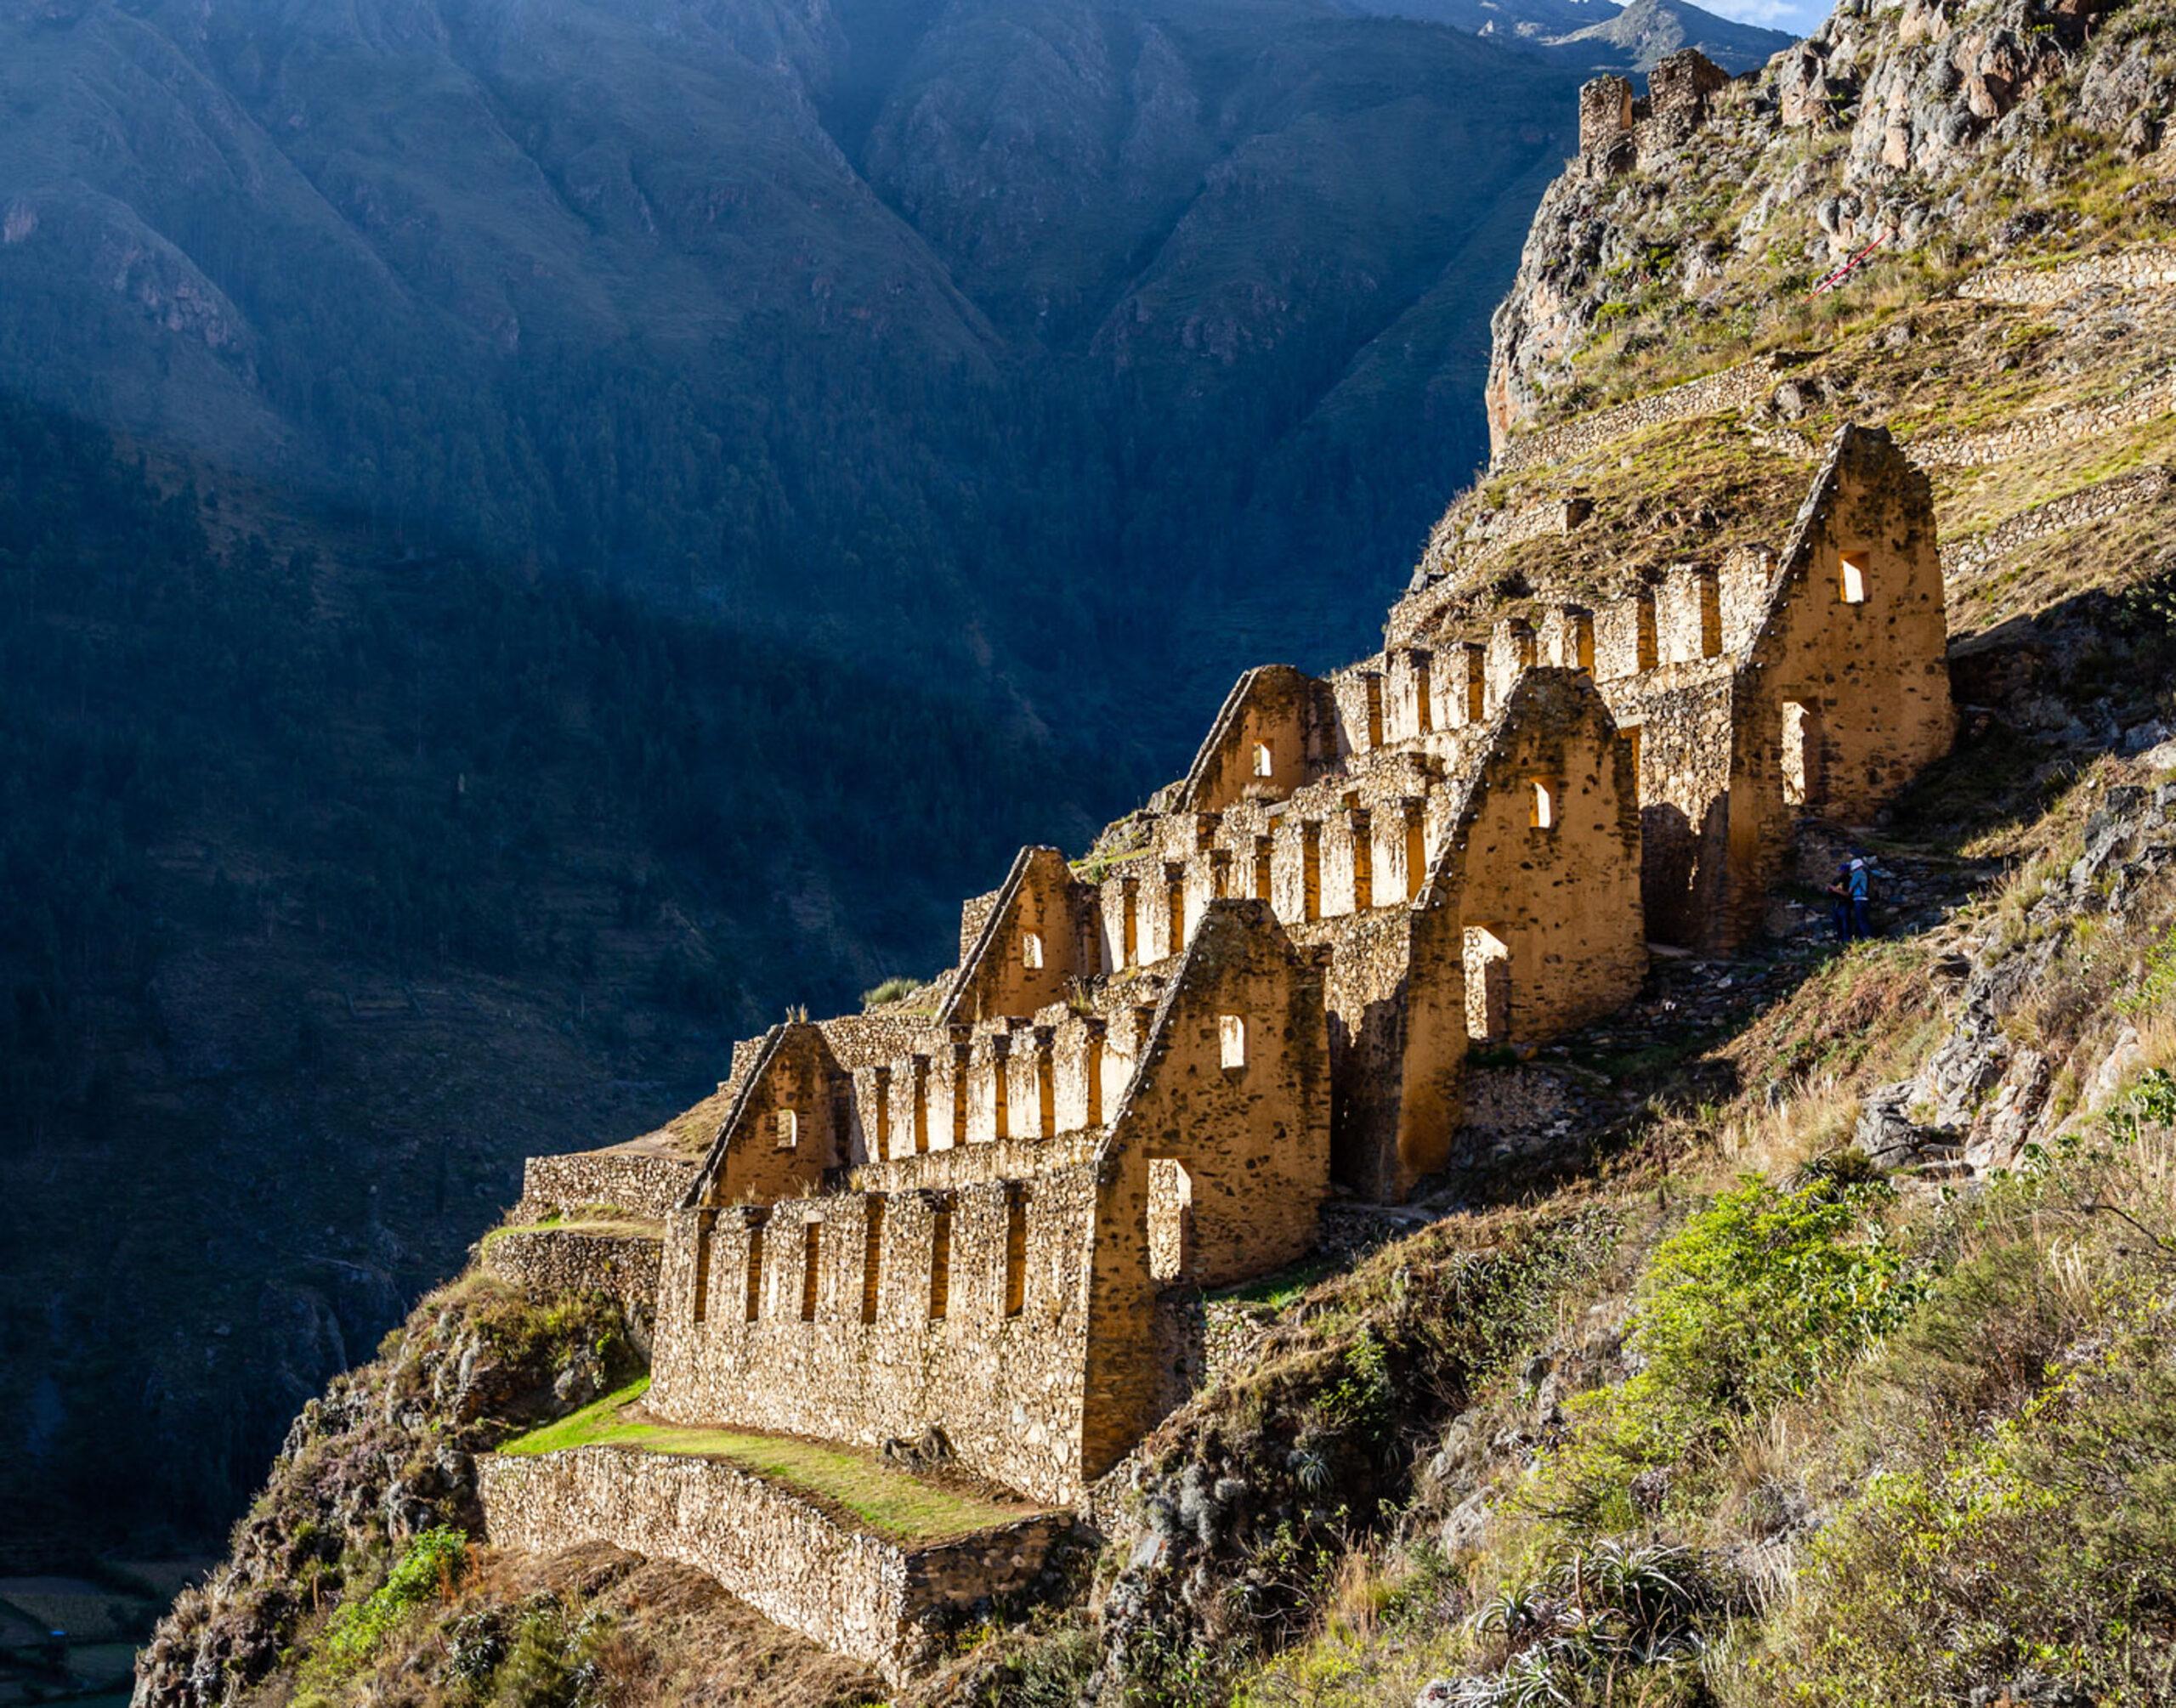 Ruins on a mountainside in ollaytaytambo peru